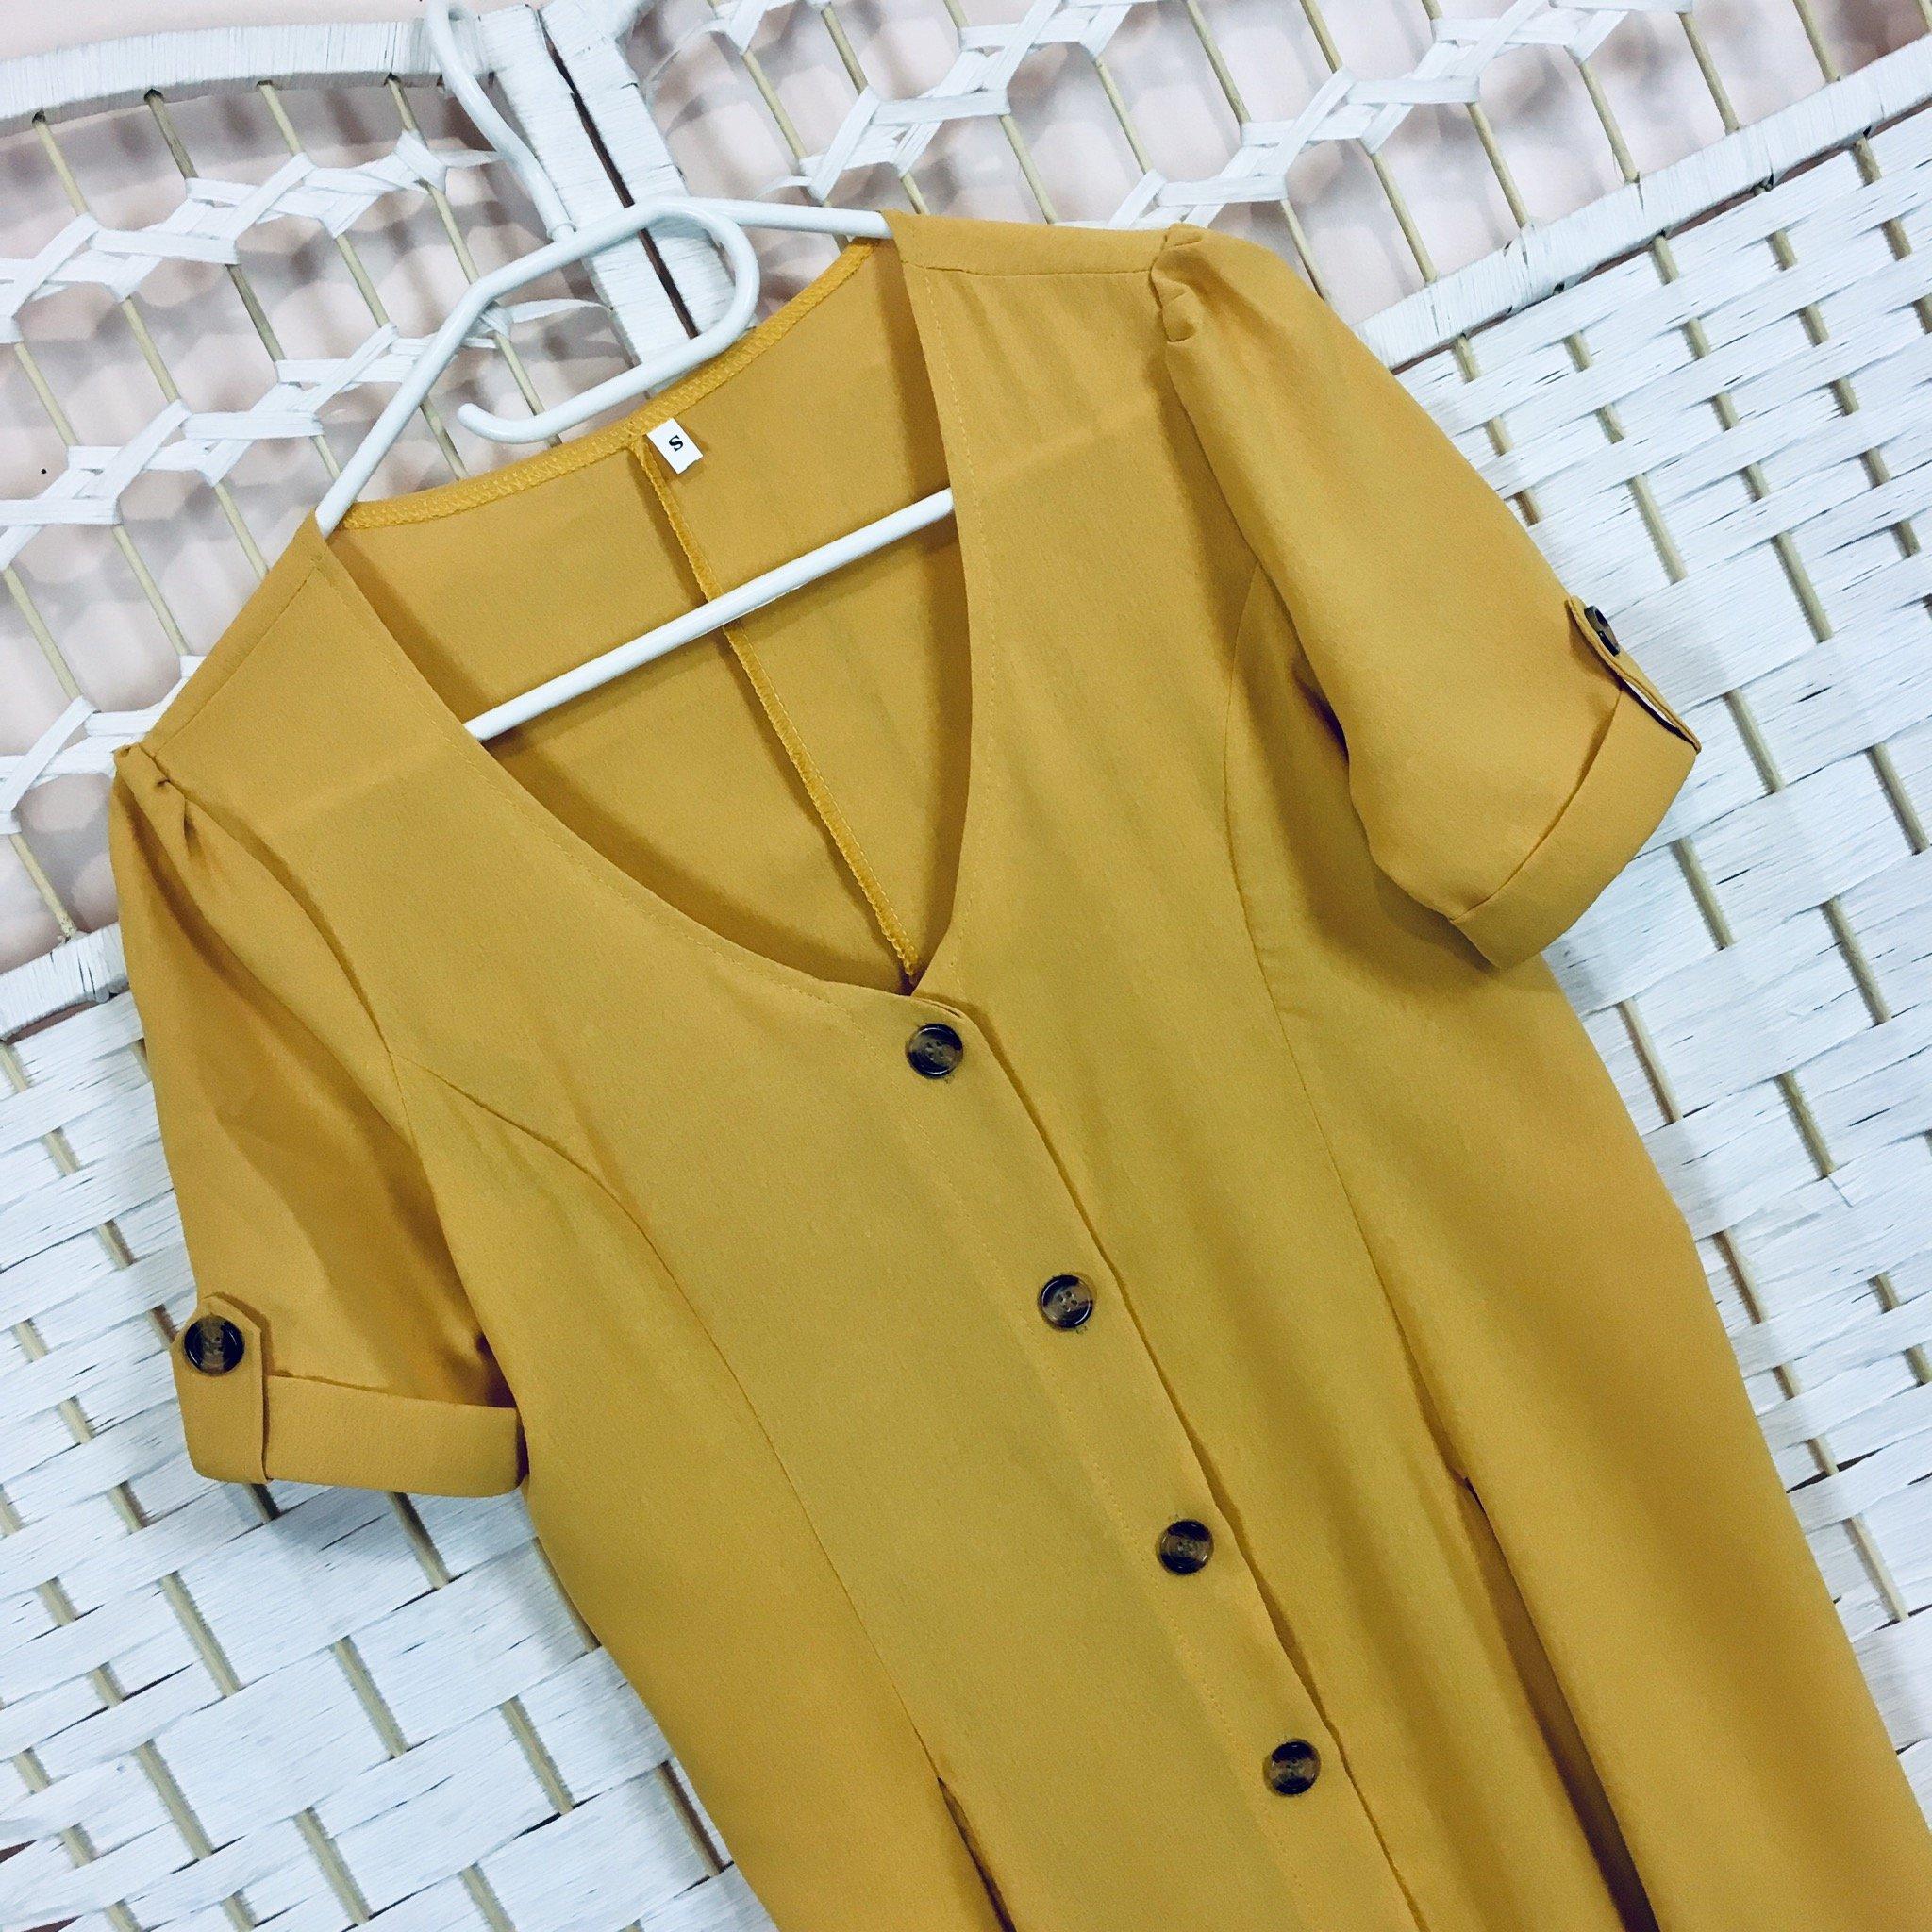 Платье халатик из miss moly Trendy Store - купить